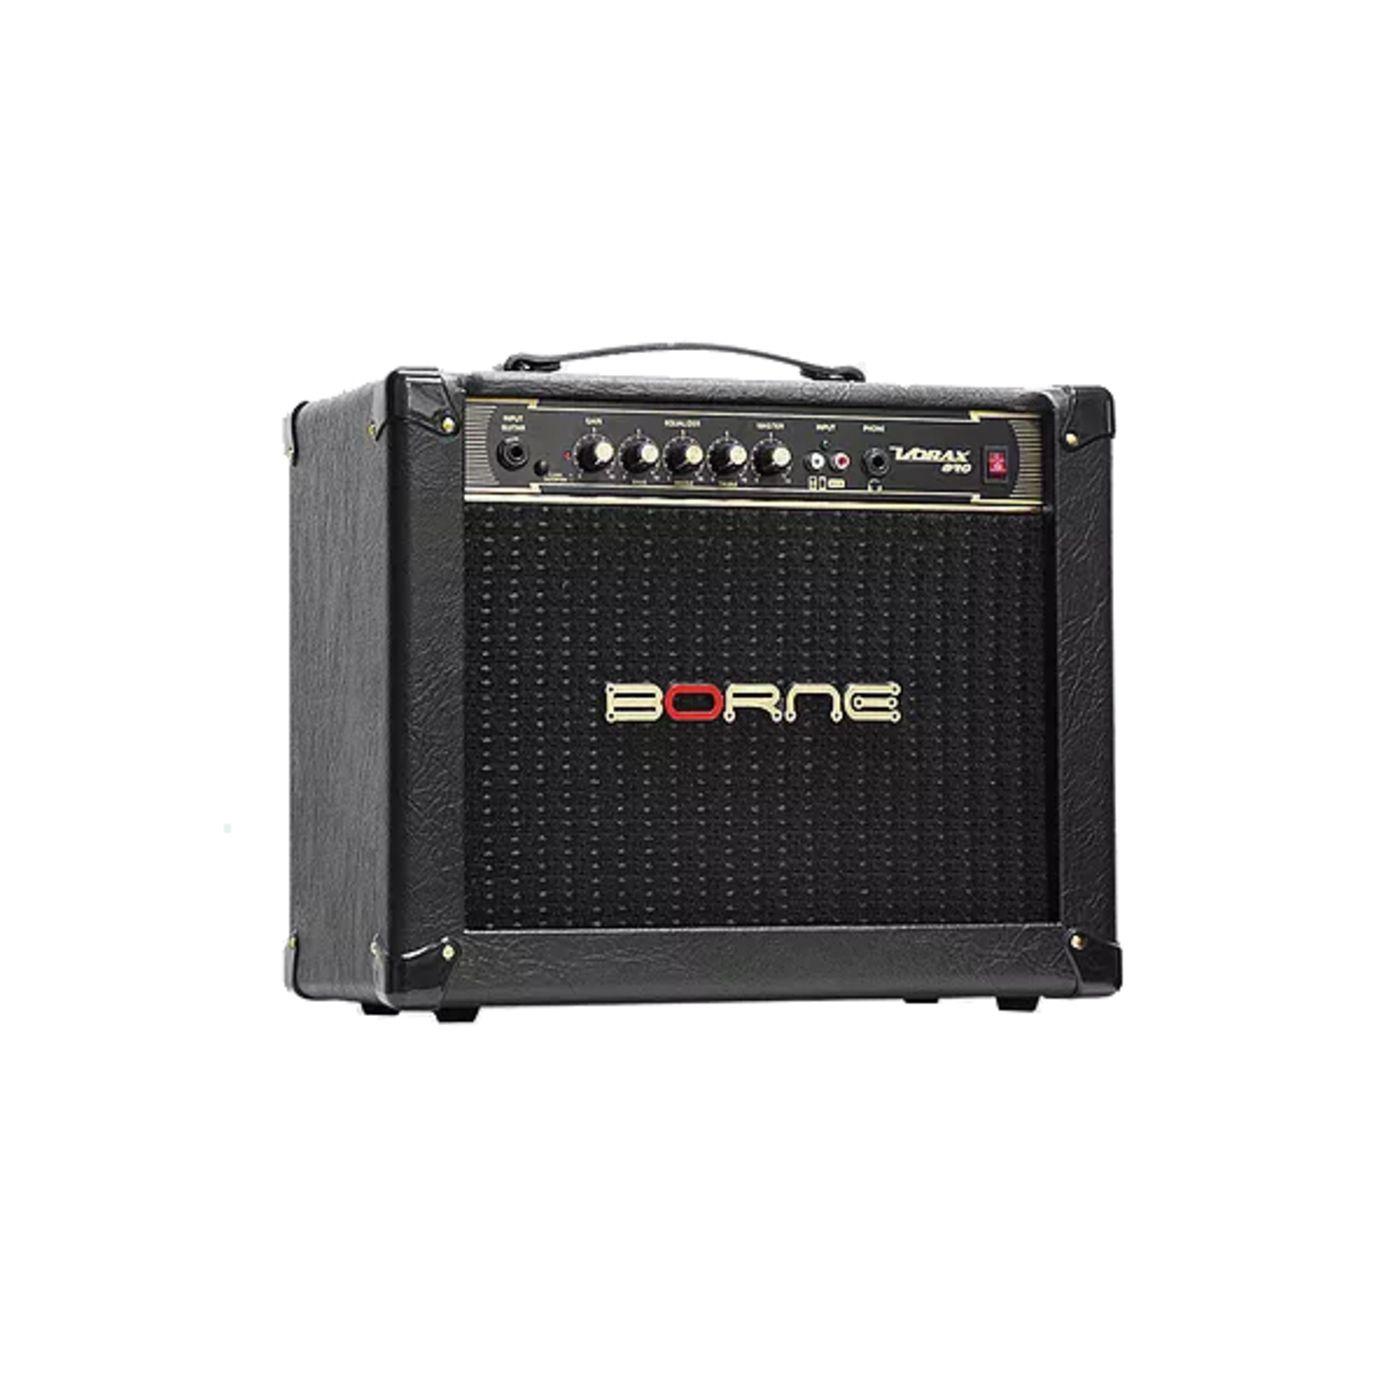 Amplificador Borne Vorax 630 Para Guitarra 6.5 Pol 25w rms